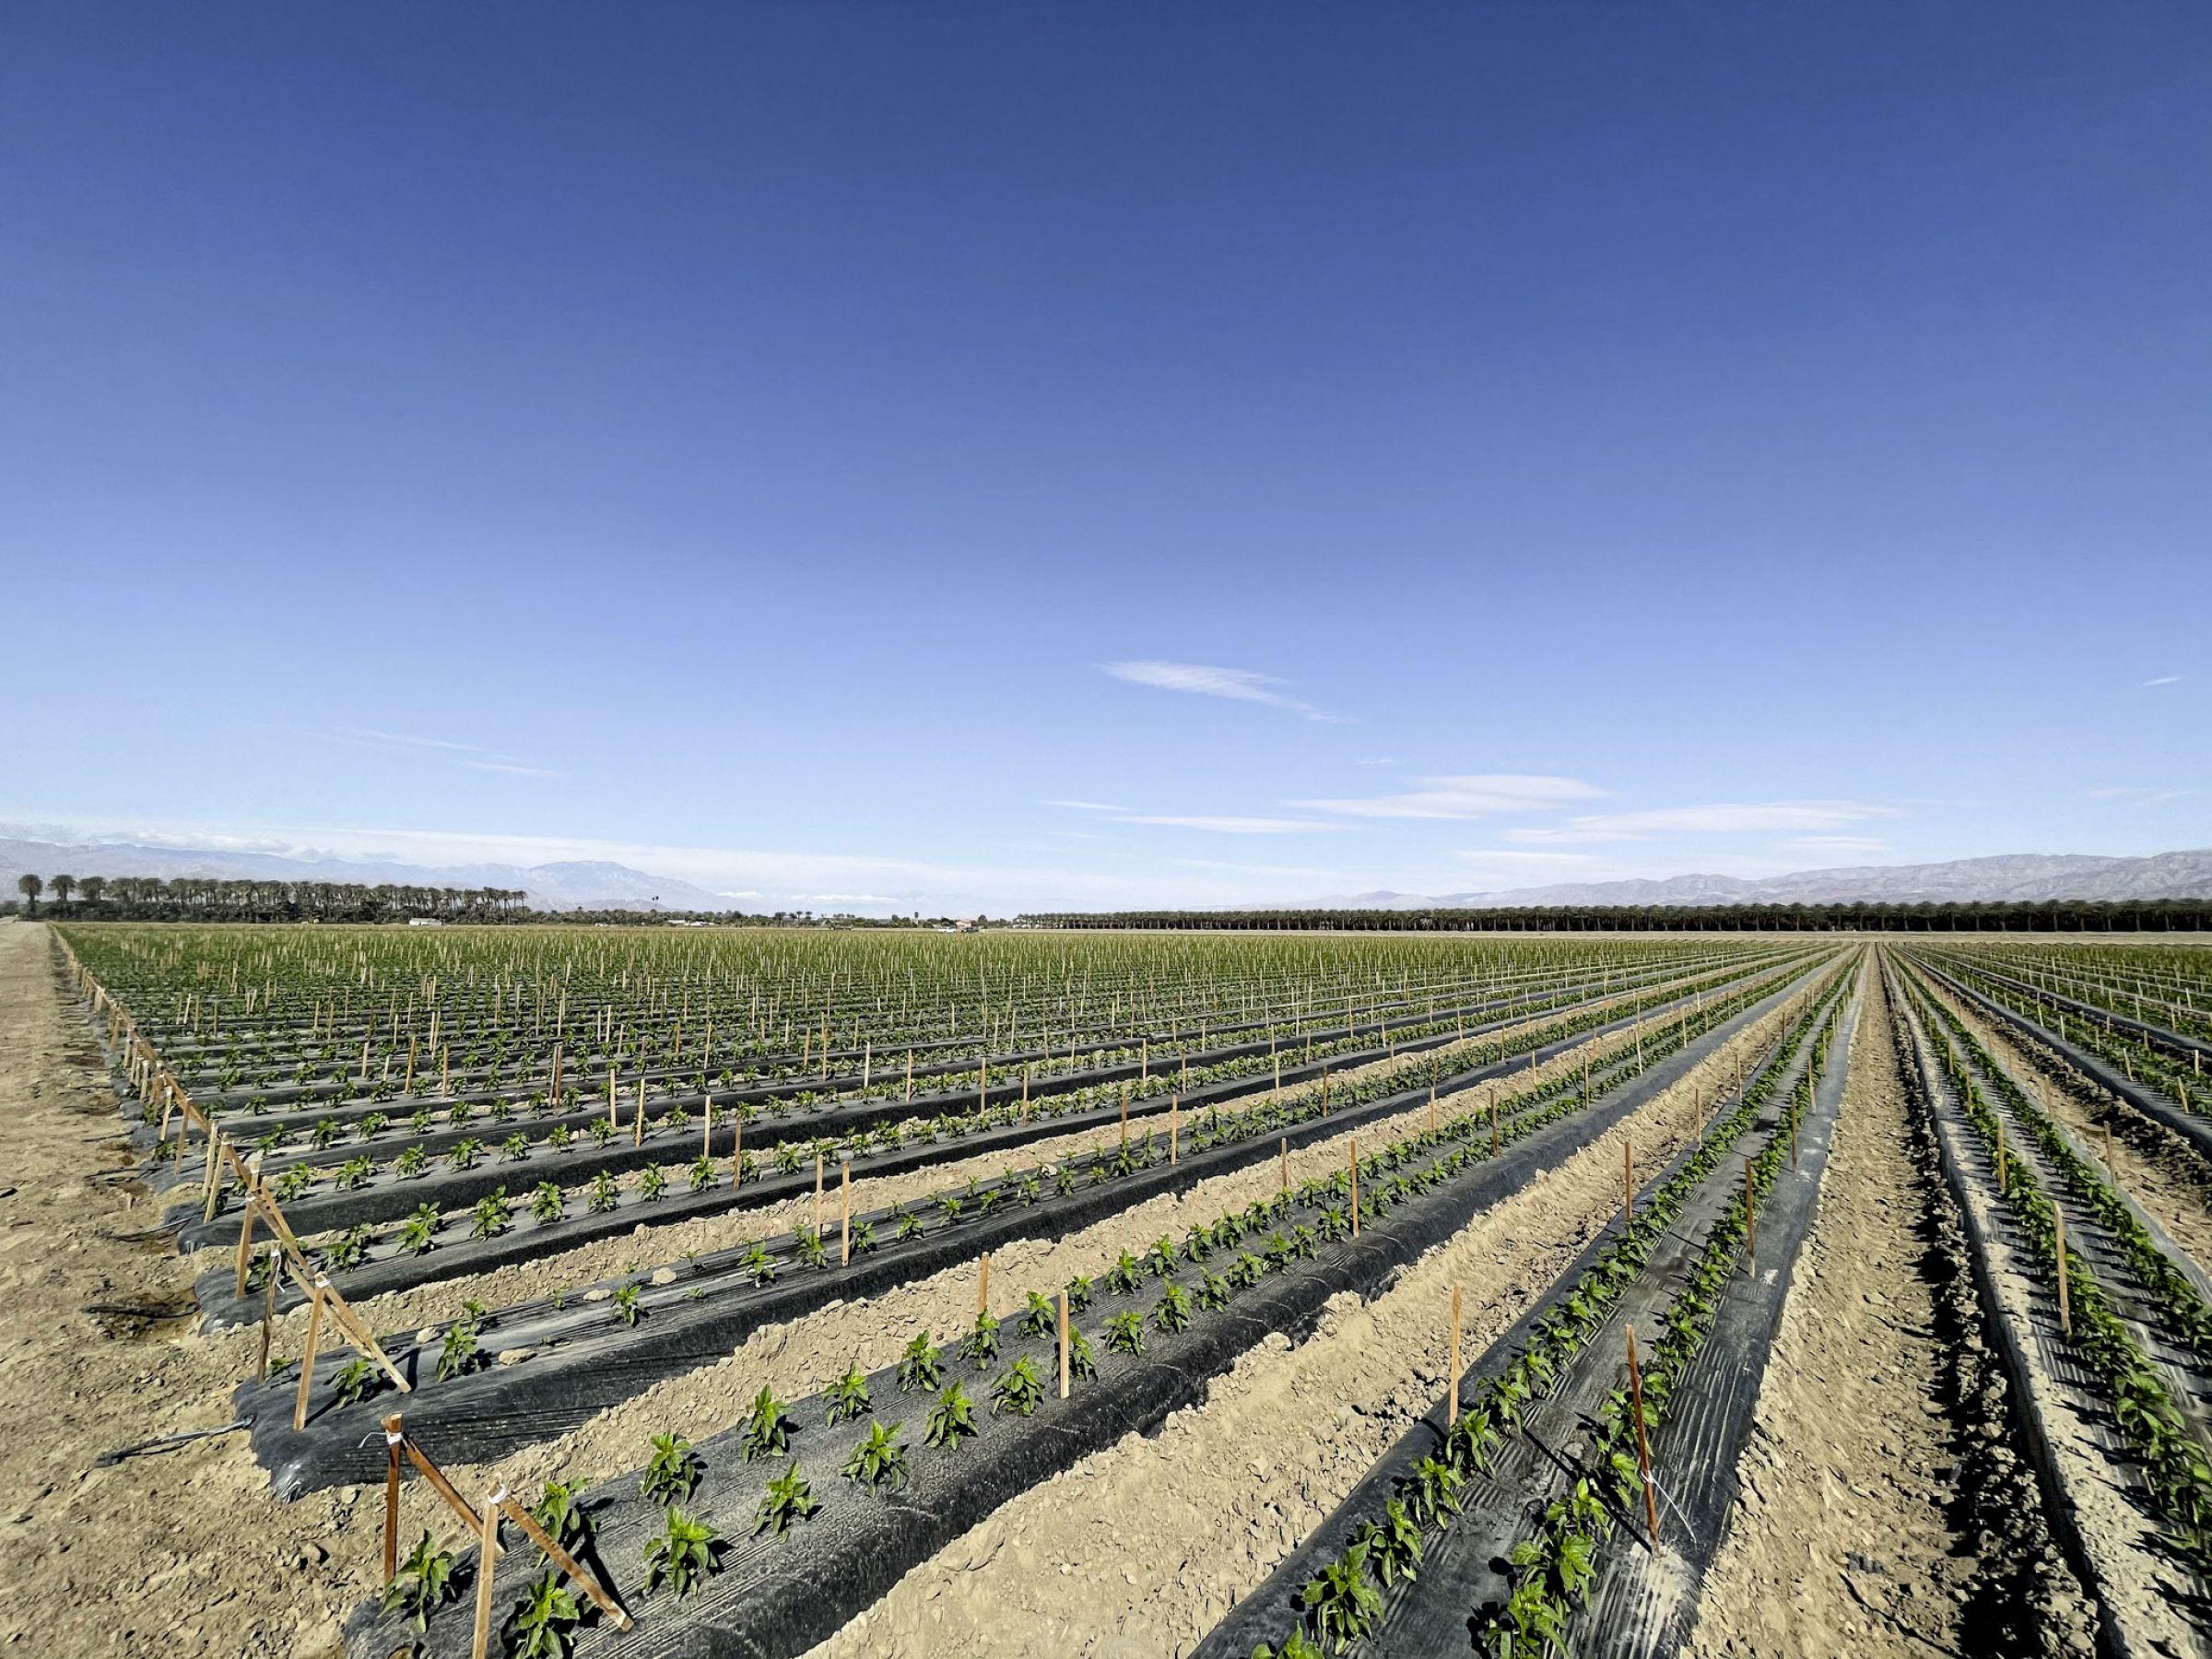 land-riverside-county-california-118-acres-listing-number-15577-2-2021-06-09-193706.jpg